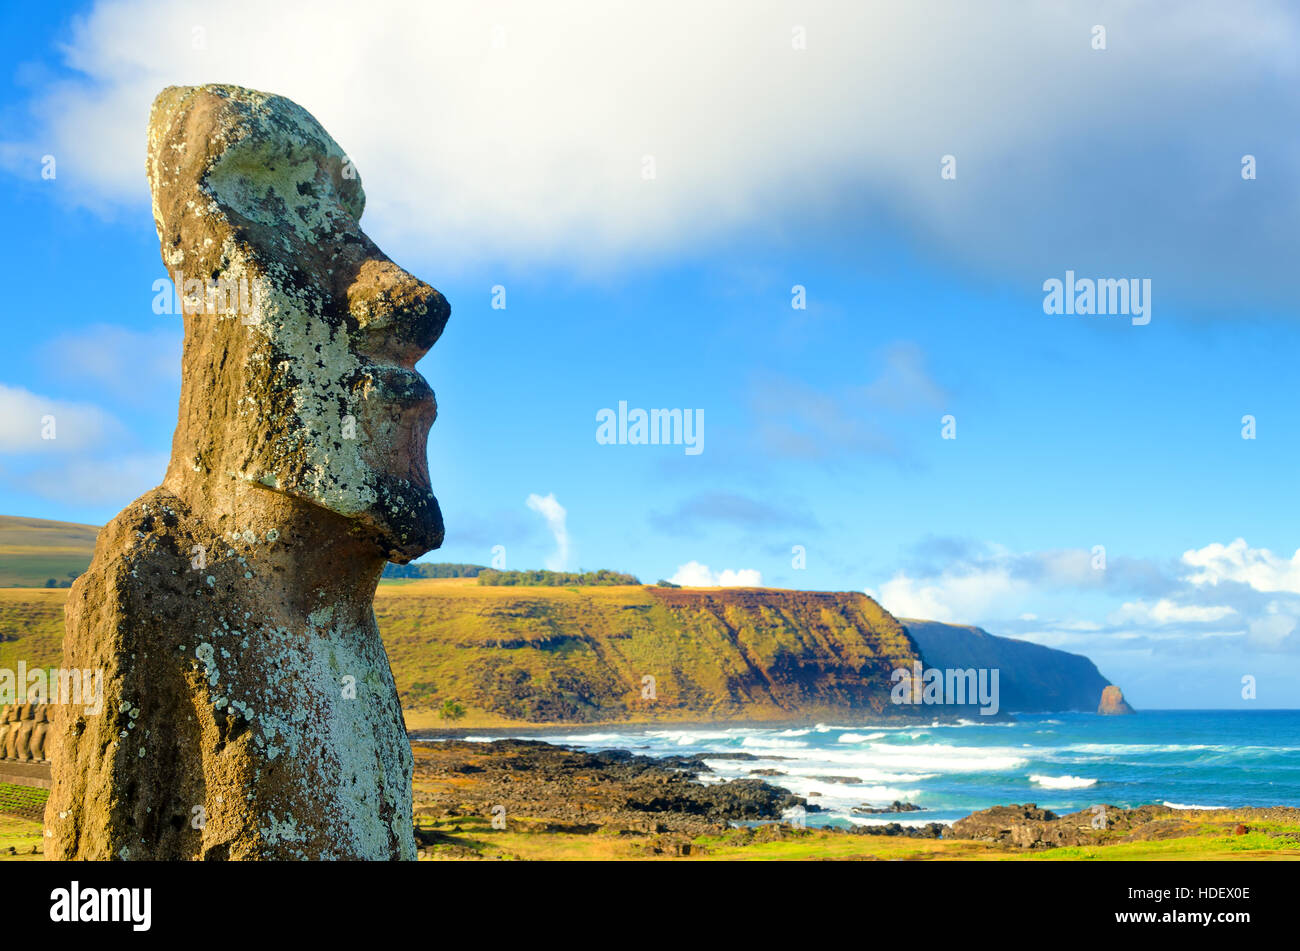 Primer plano de gran Moai en Ahu Tongariki en la Isla de Pascua, Chile Imagen De Stock